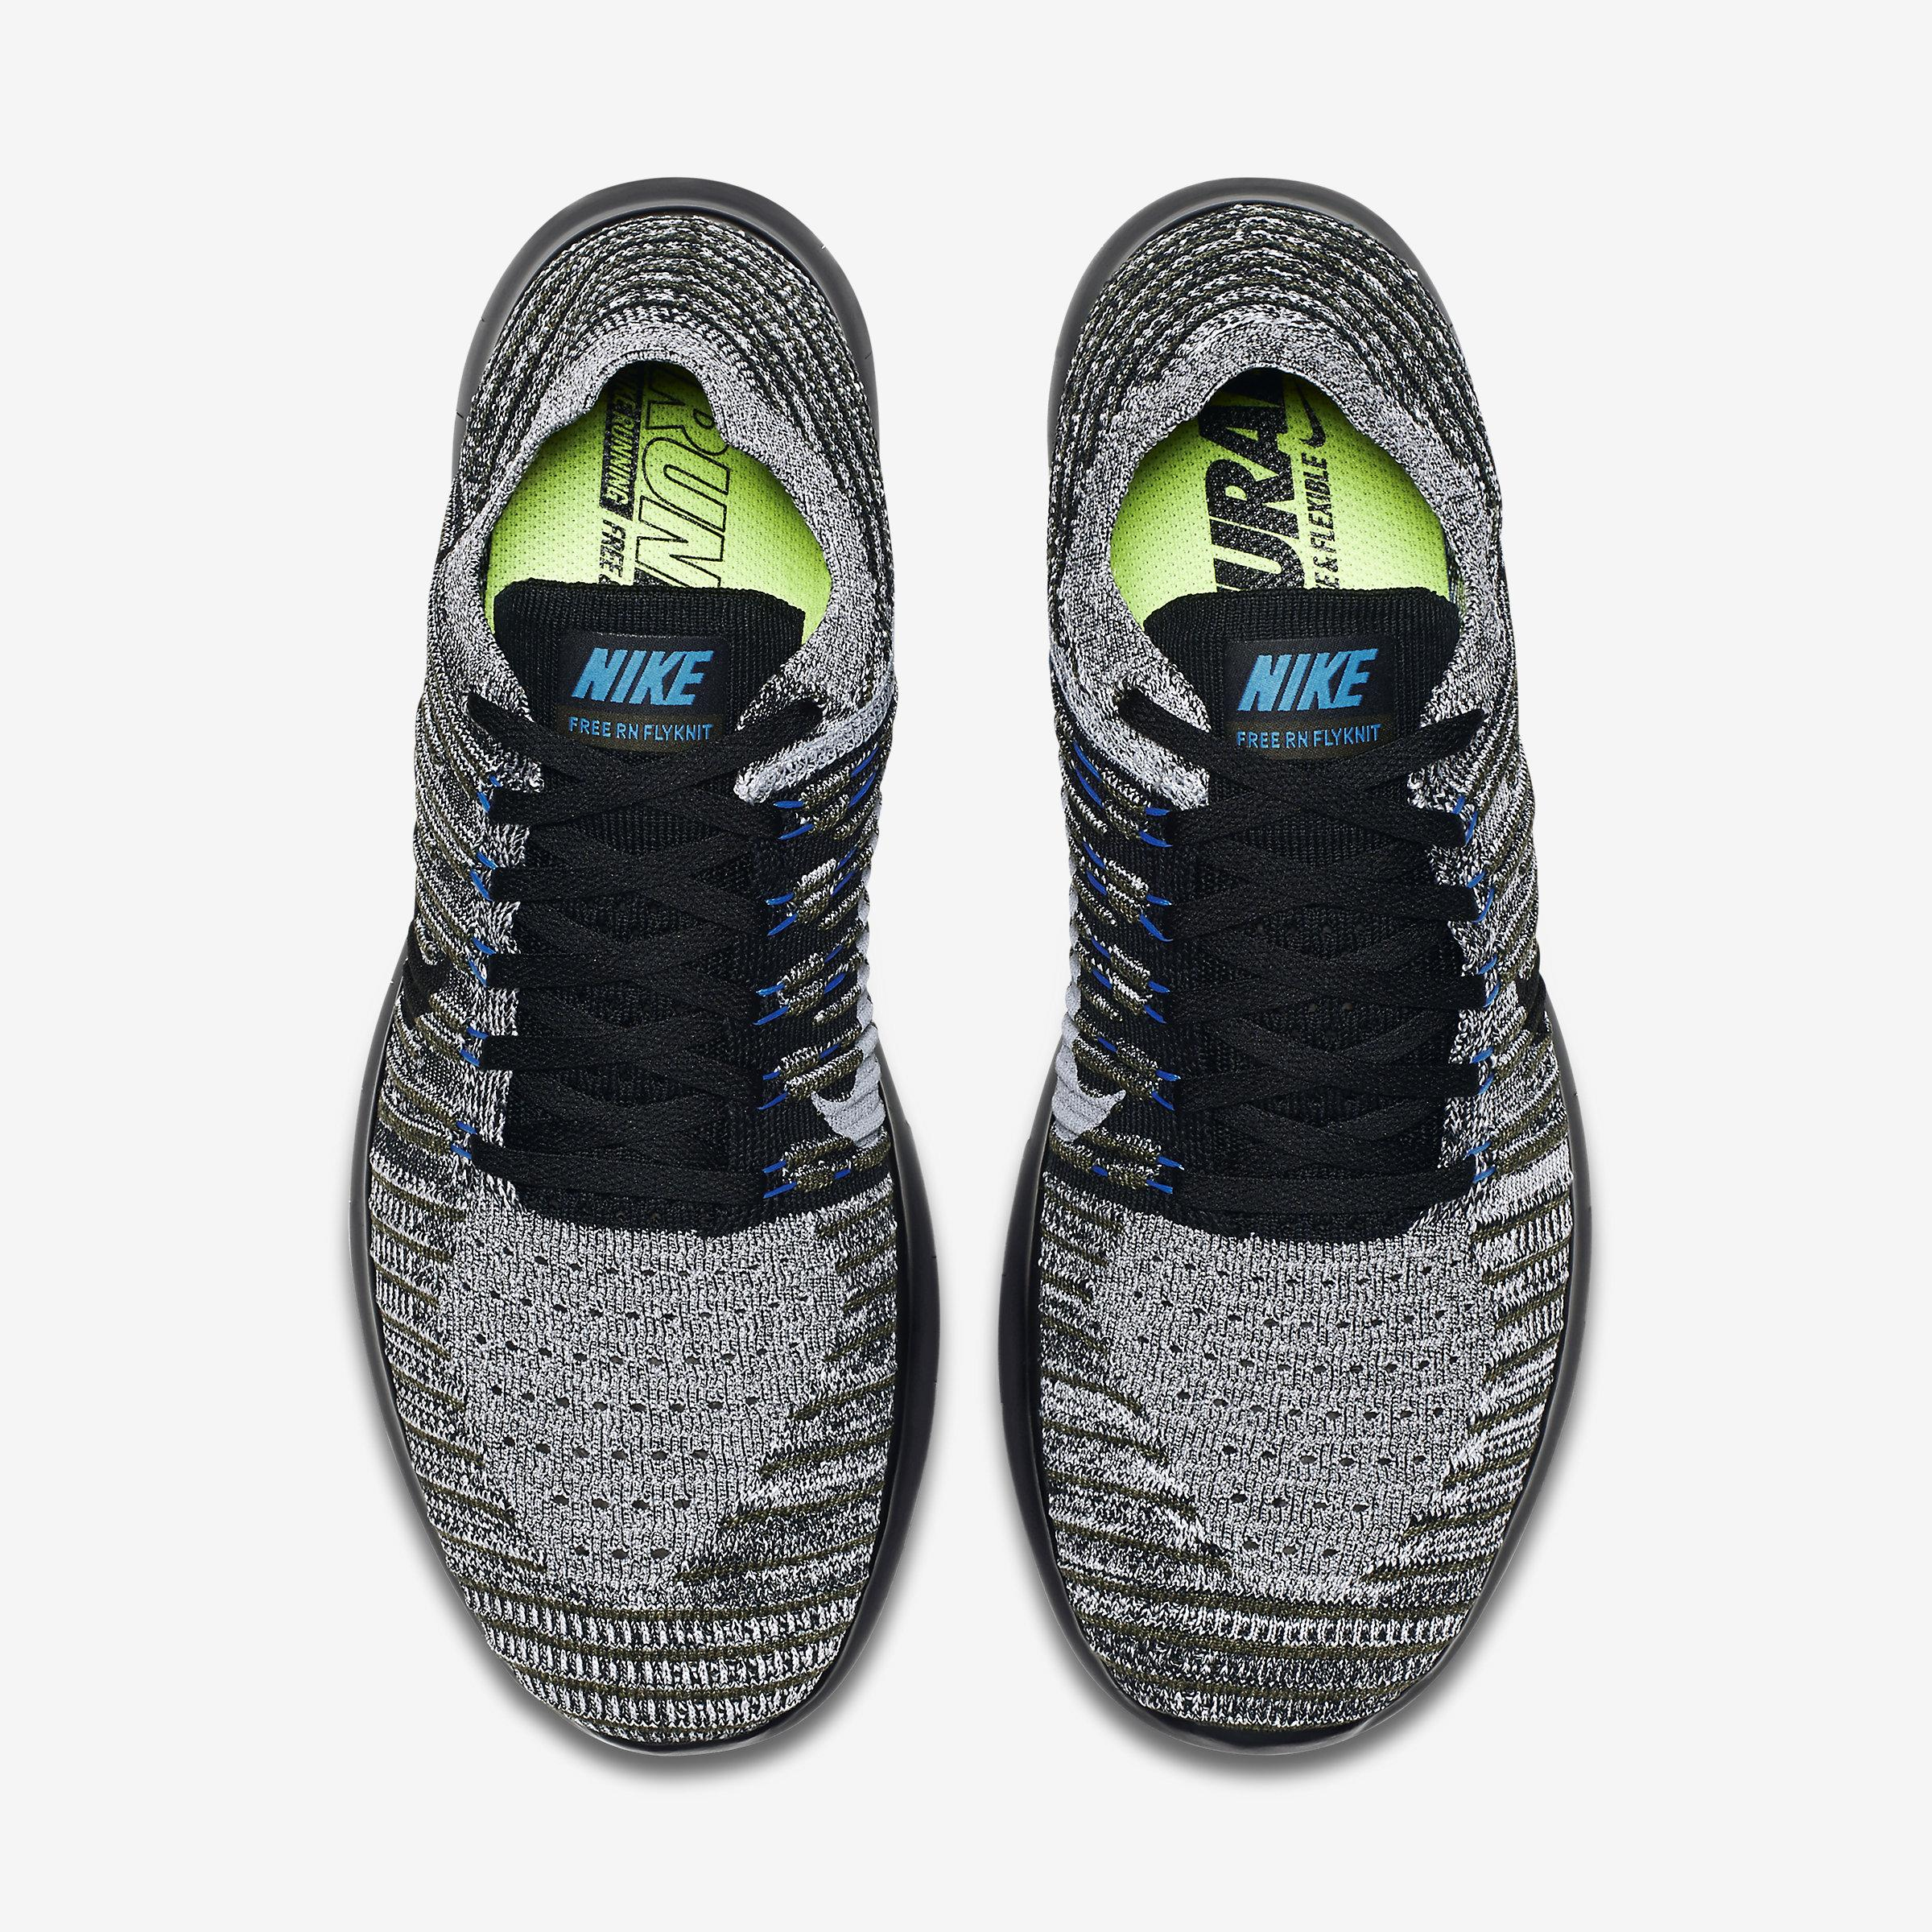 9d8f1bc115f0 Nike Free Rn Flyknit Men s Running Shoe in Blue for Men - Lyst